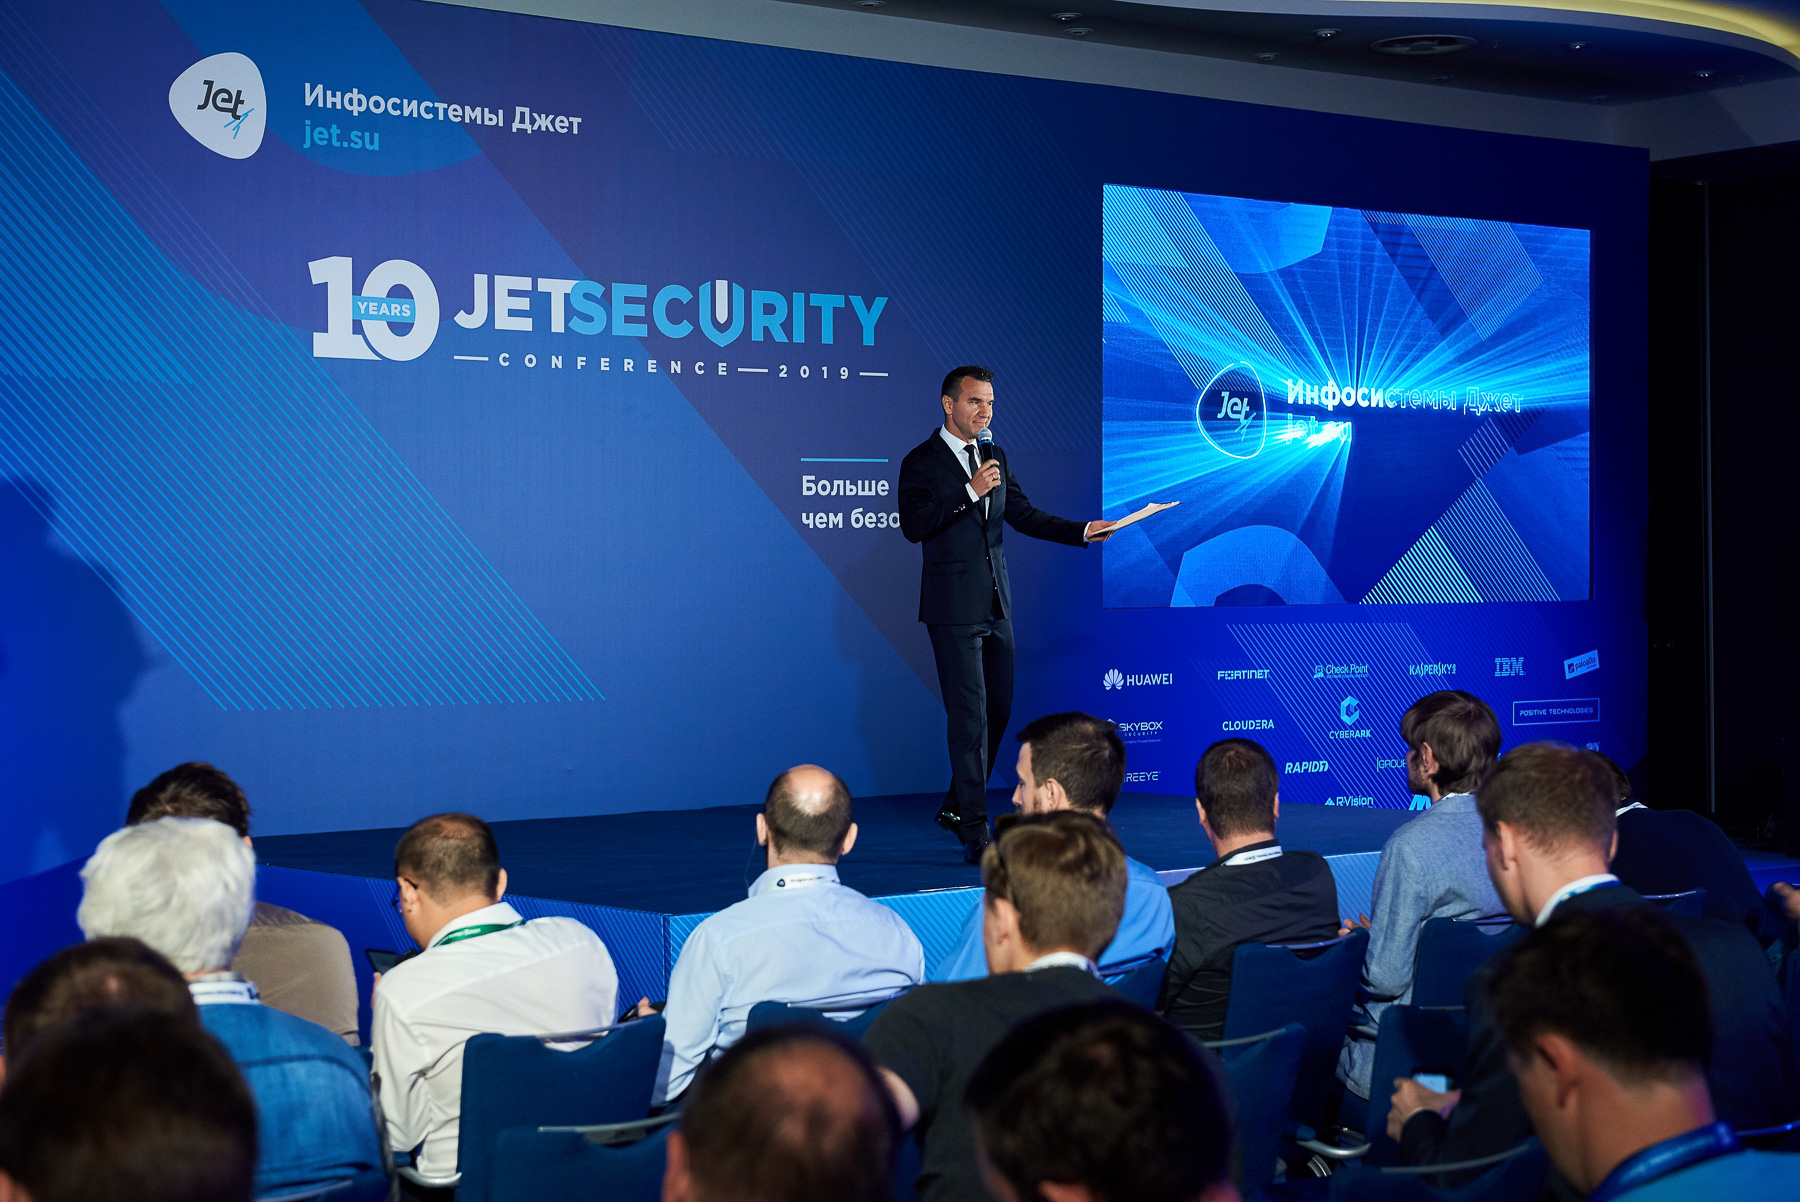 2019-06-06 Jet 202